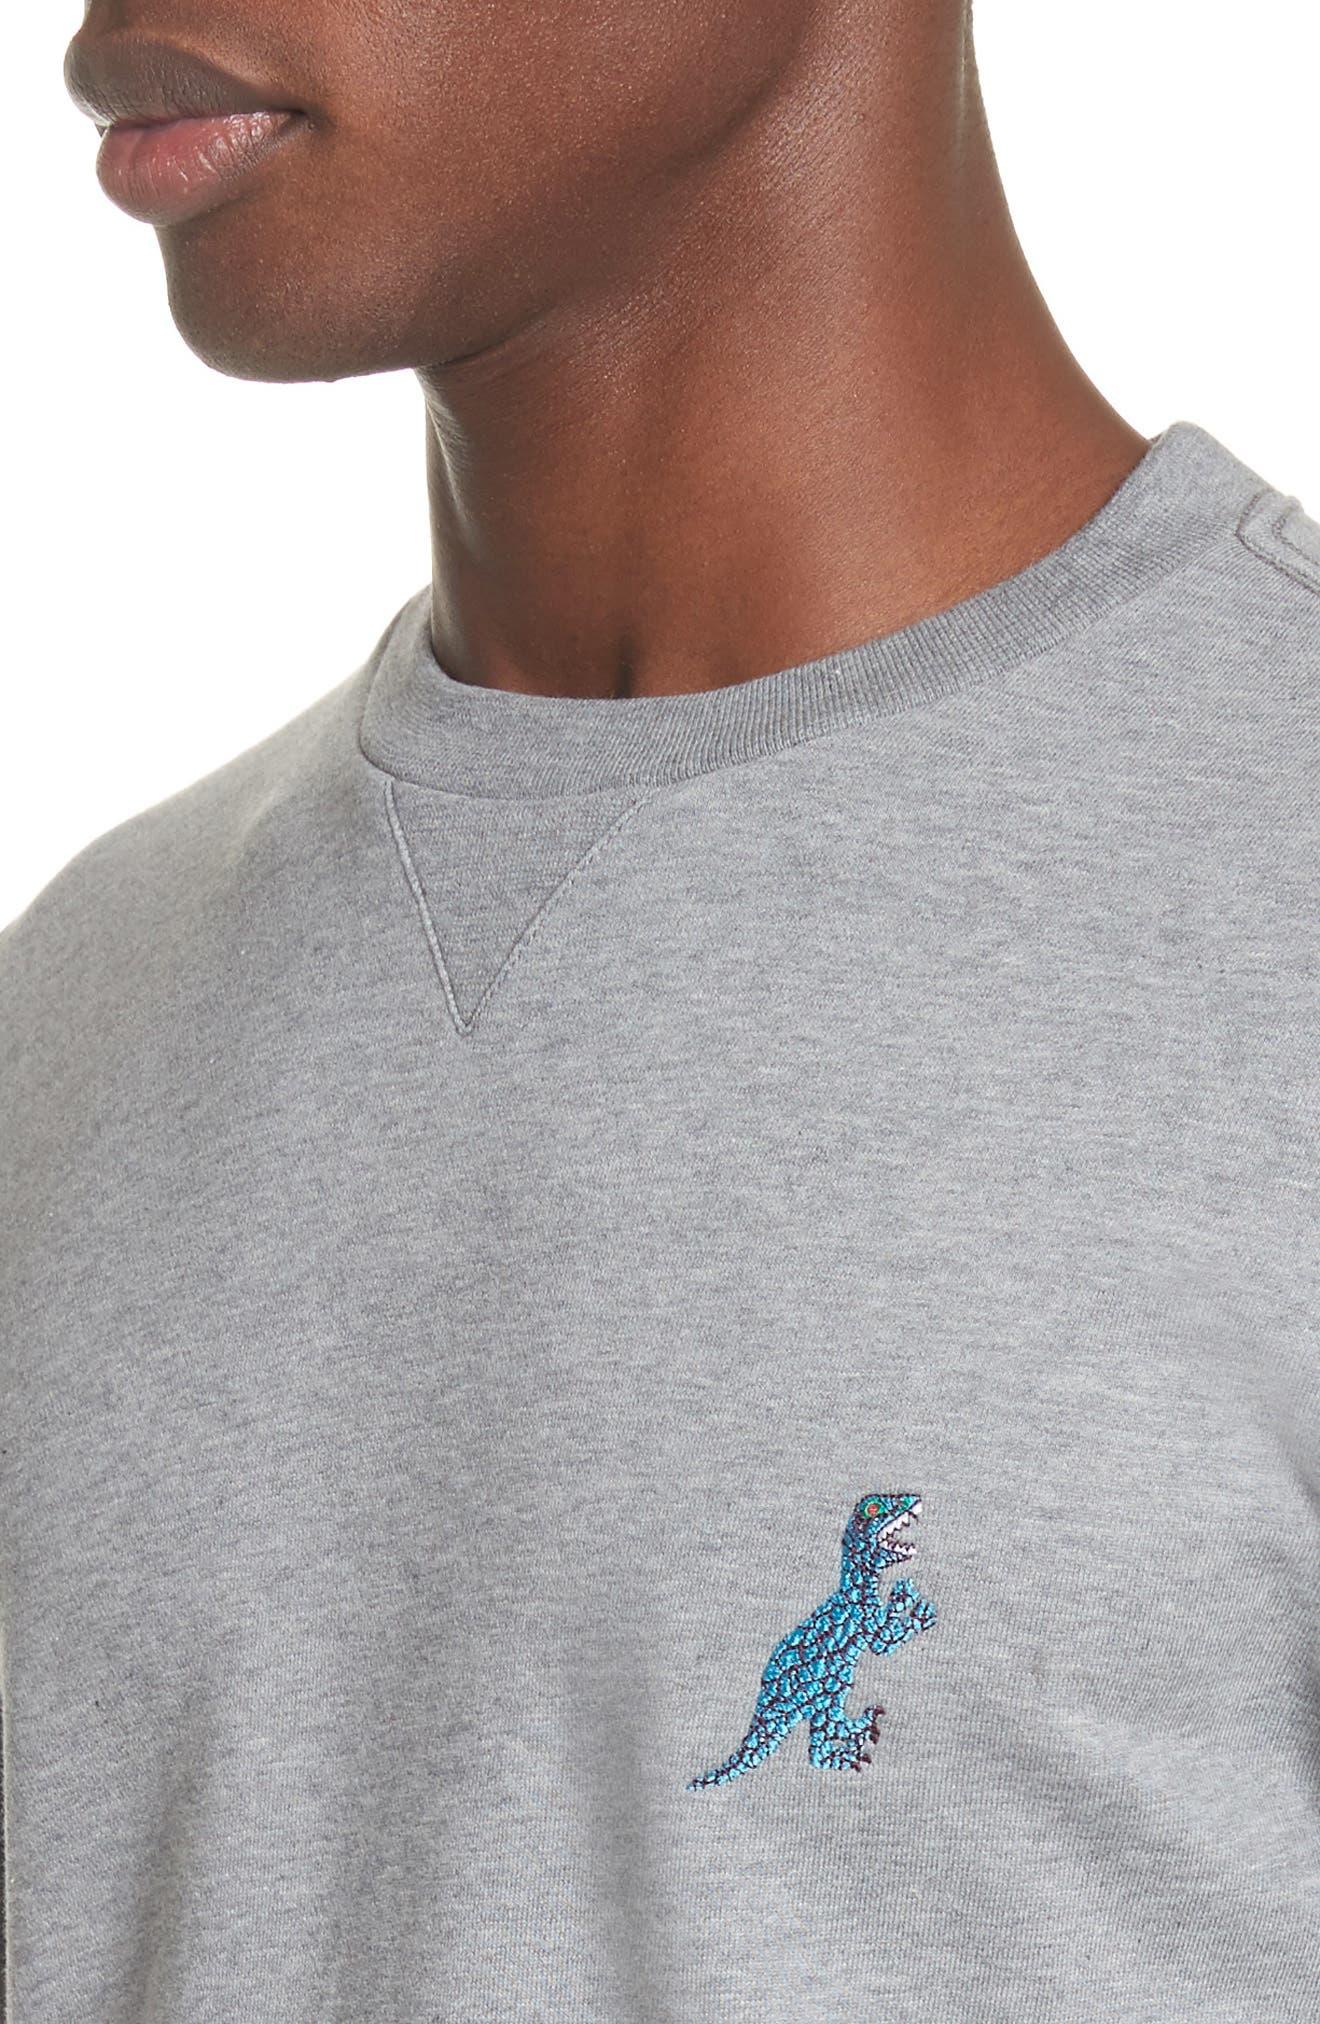 Dino Embroidered Crewneck Sweatshirt,                             Alternate thumbnail 4, color,